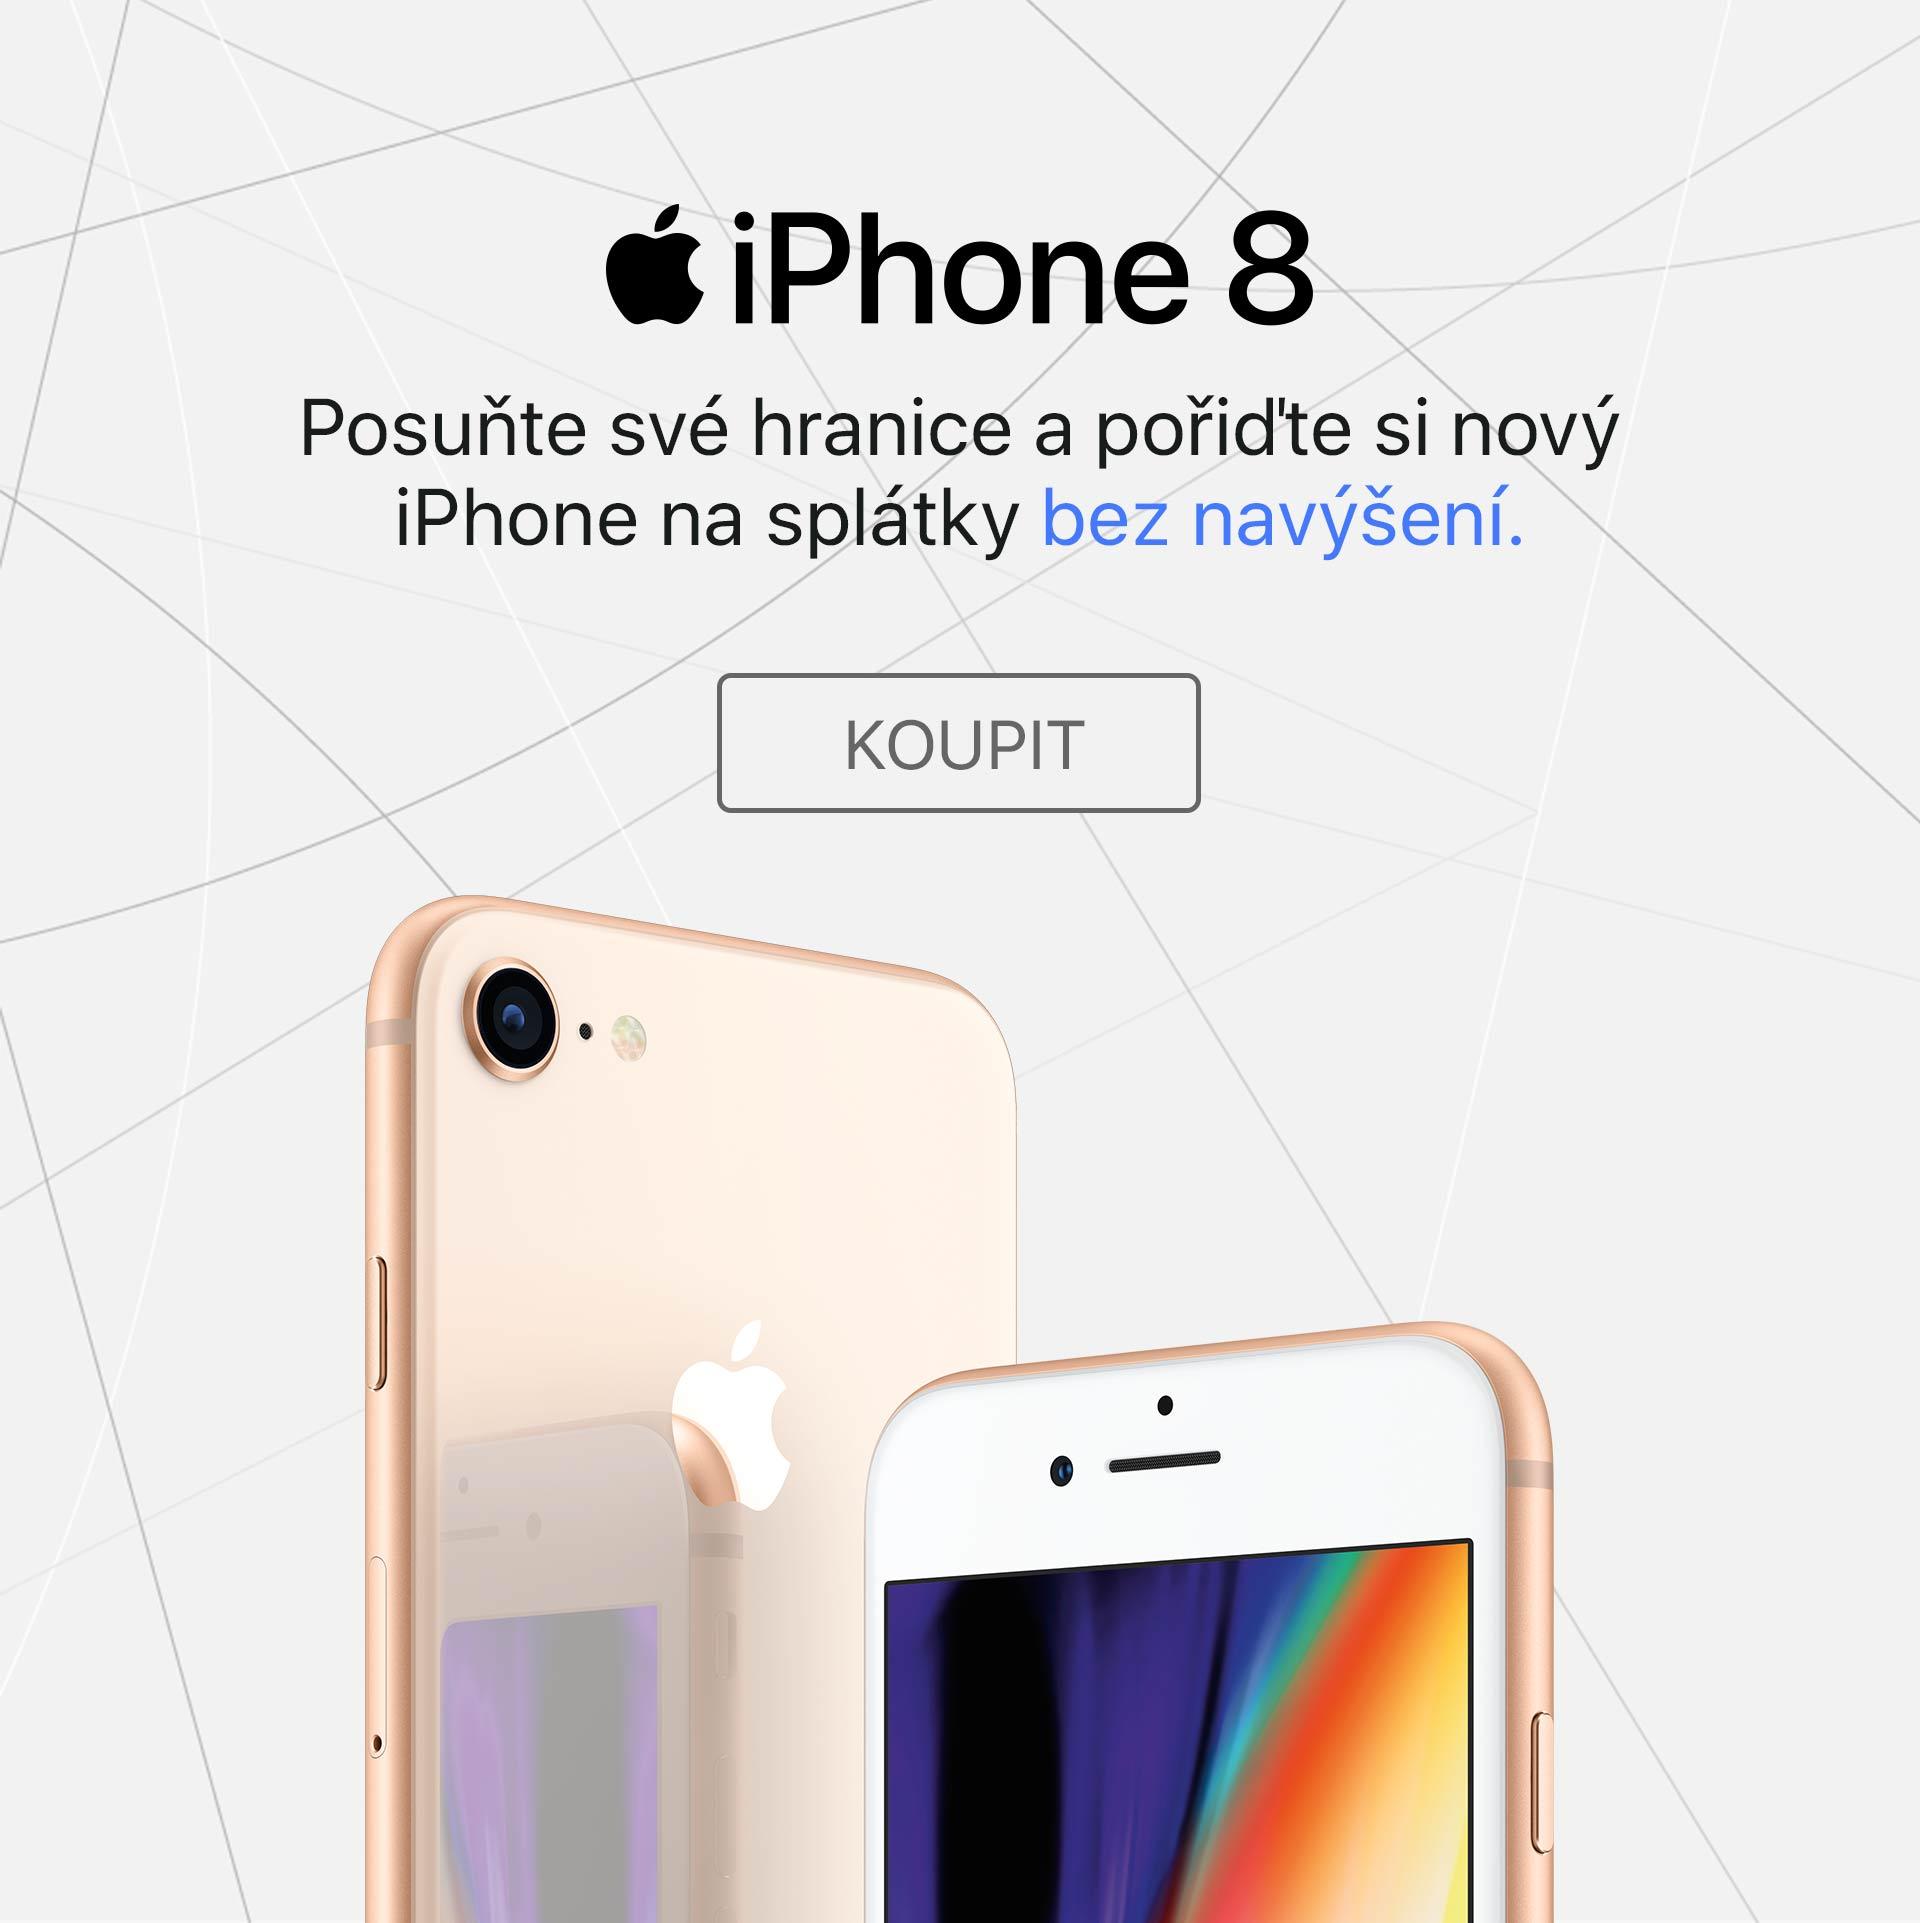 iPhone 8 splatky